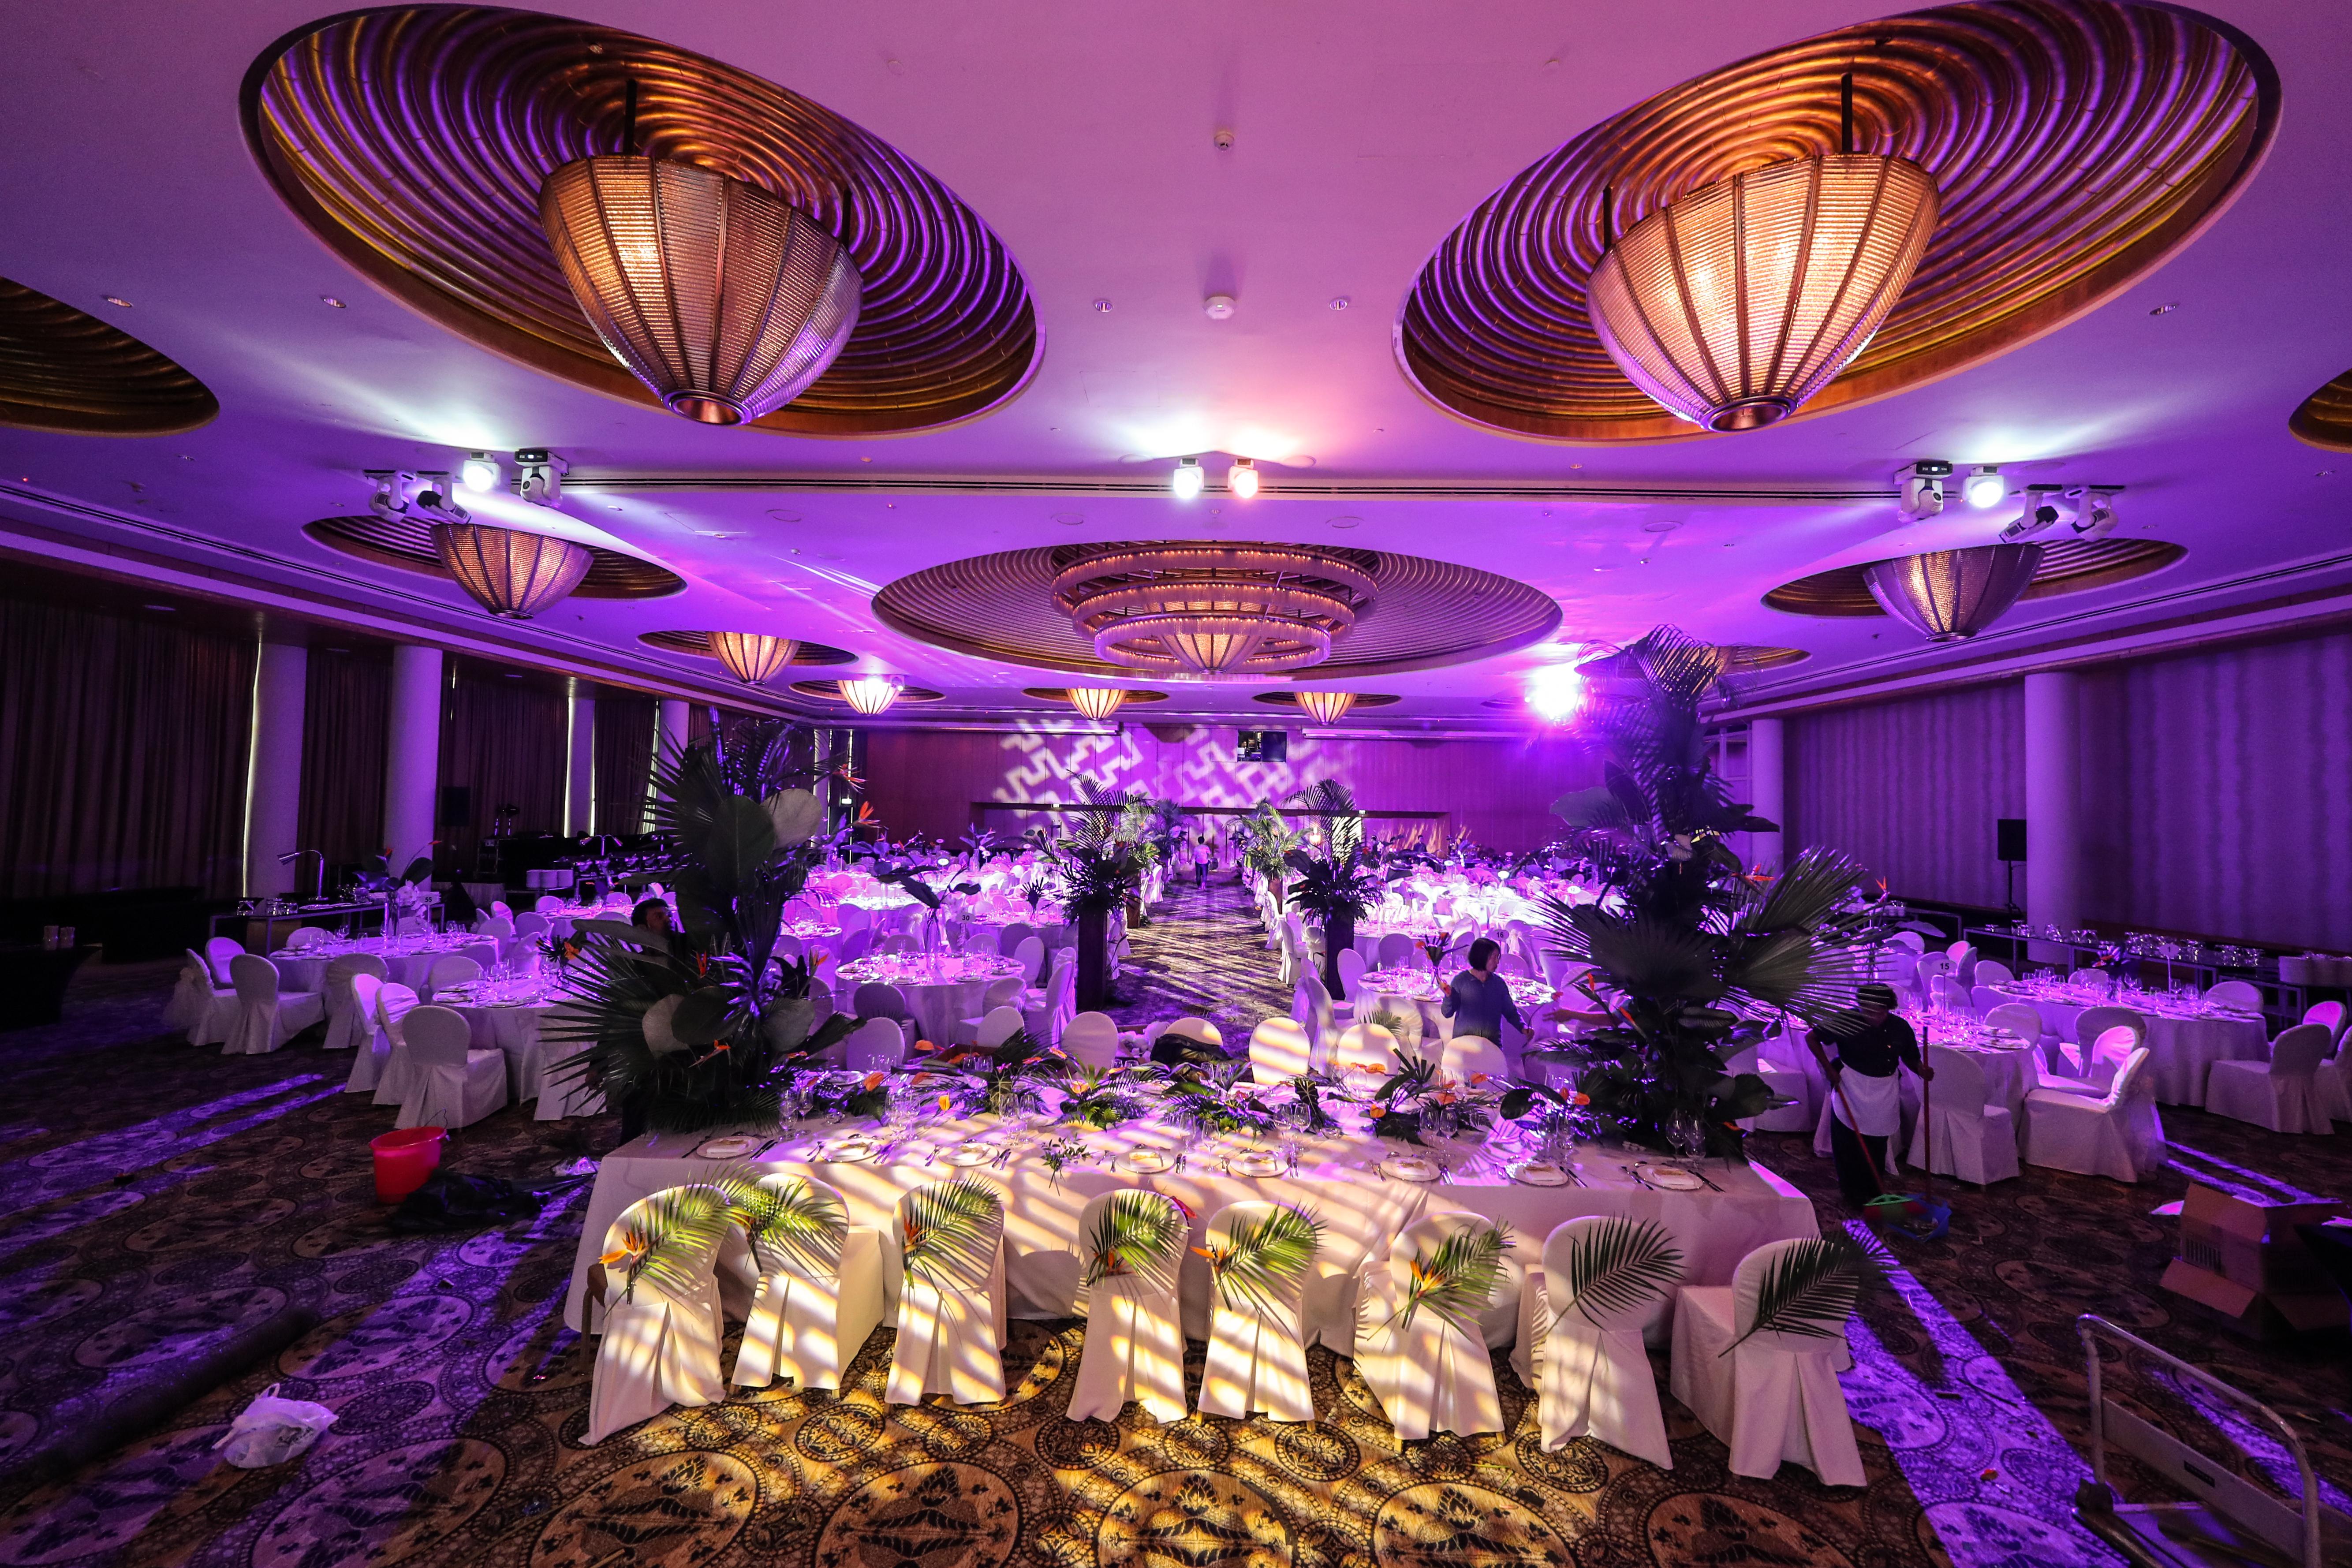 Harman Professional Solutions Creates Dazzling Martin Lighting